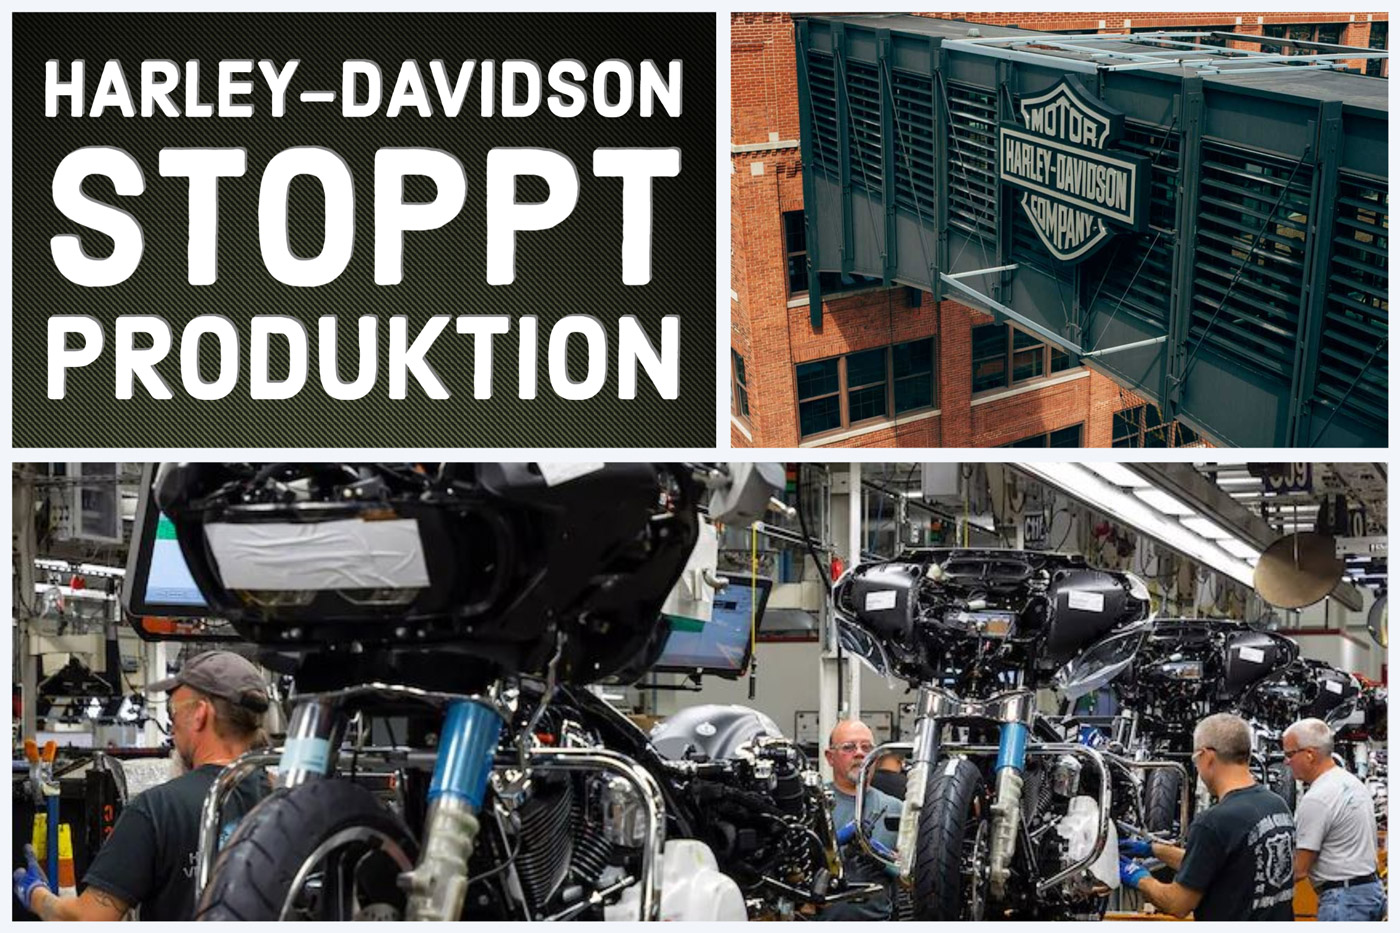 HARLEY-DAVIDSON STOPPT PRODUKTION